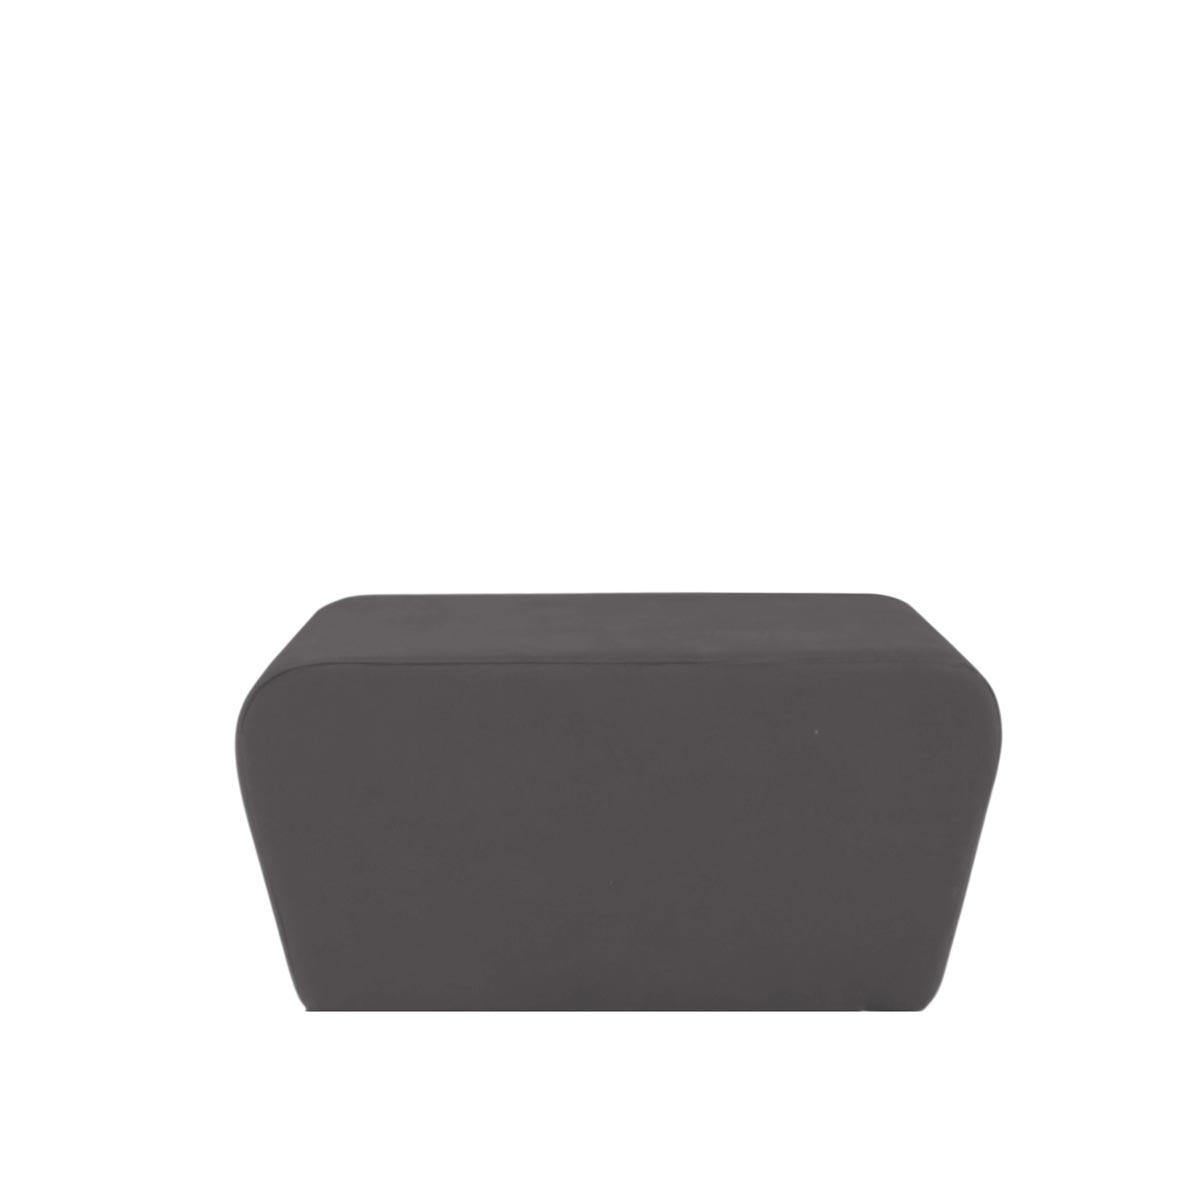 Pufe Muss R02 Tecido Lonita Caviar 03